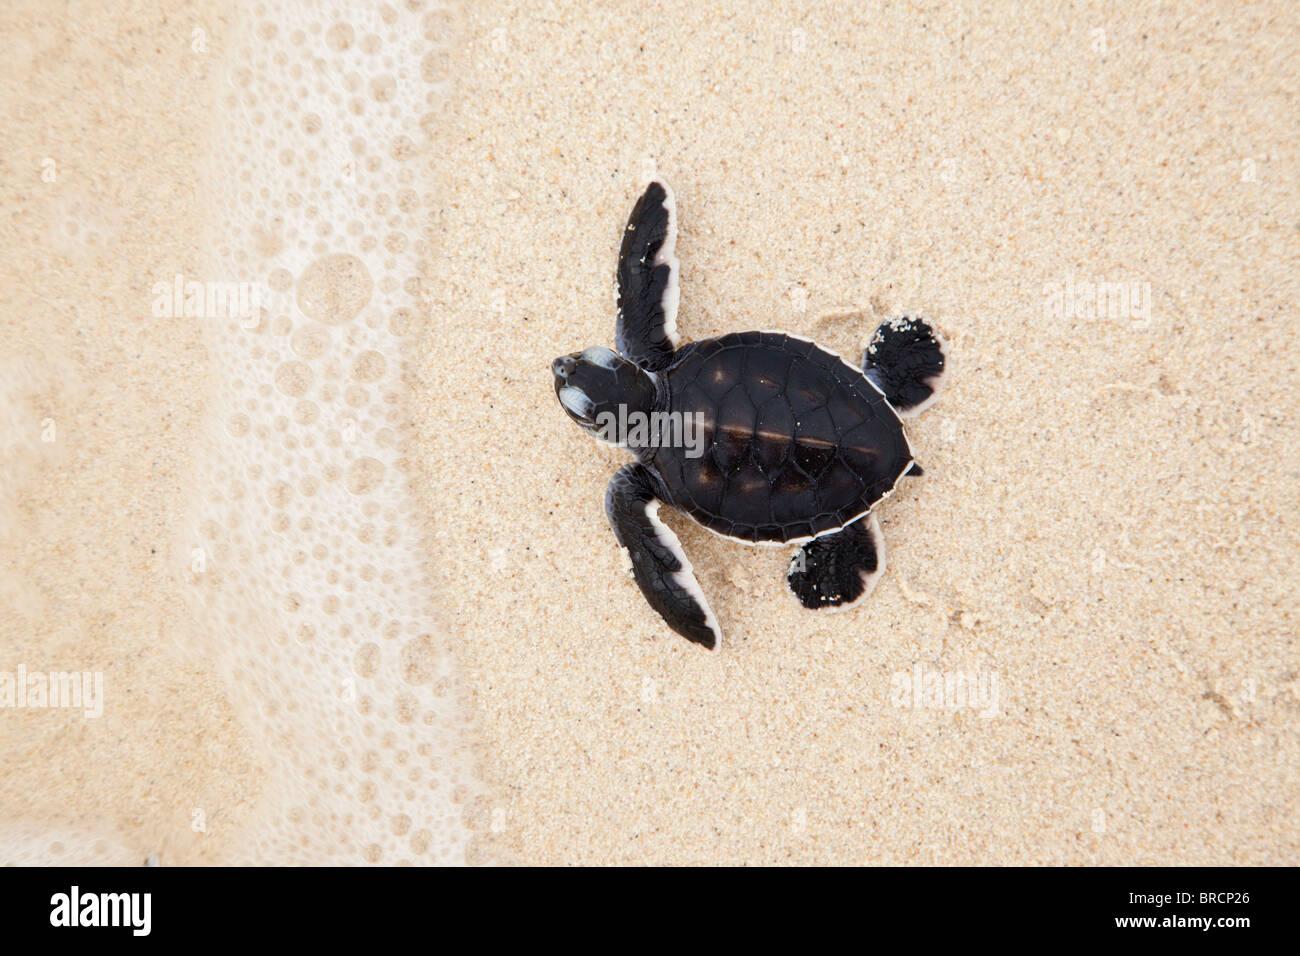 Hatchling green turtle, Chelonia mydas, making its way to the sea, Selingan Island, Sabah, Borneo - Stock Image